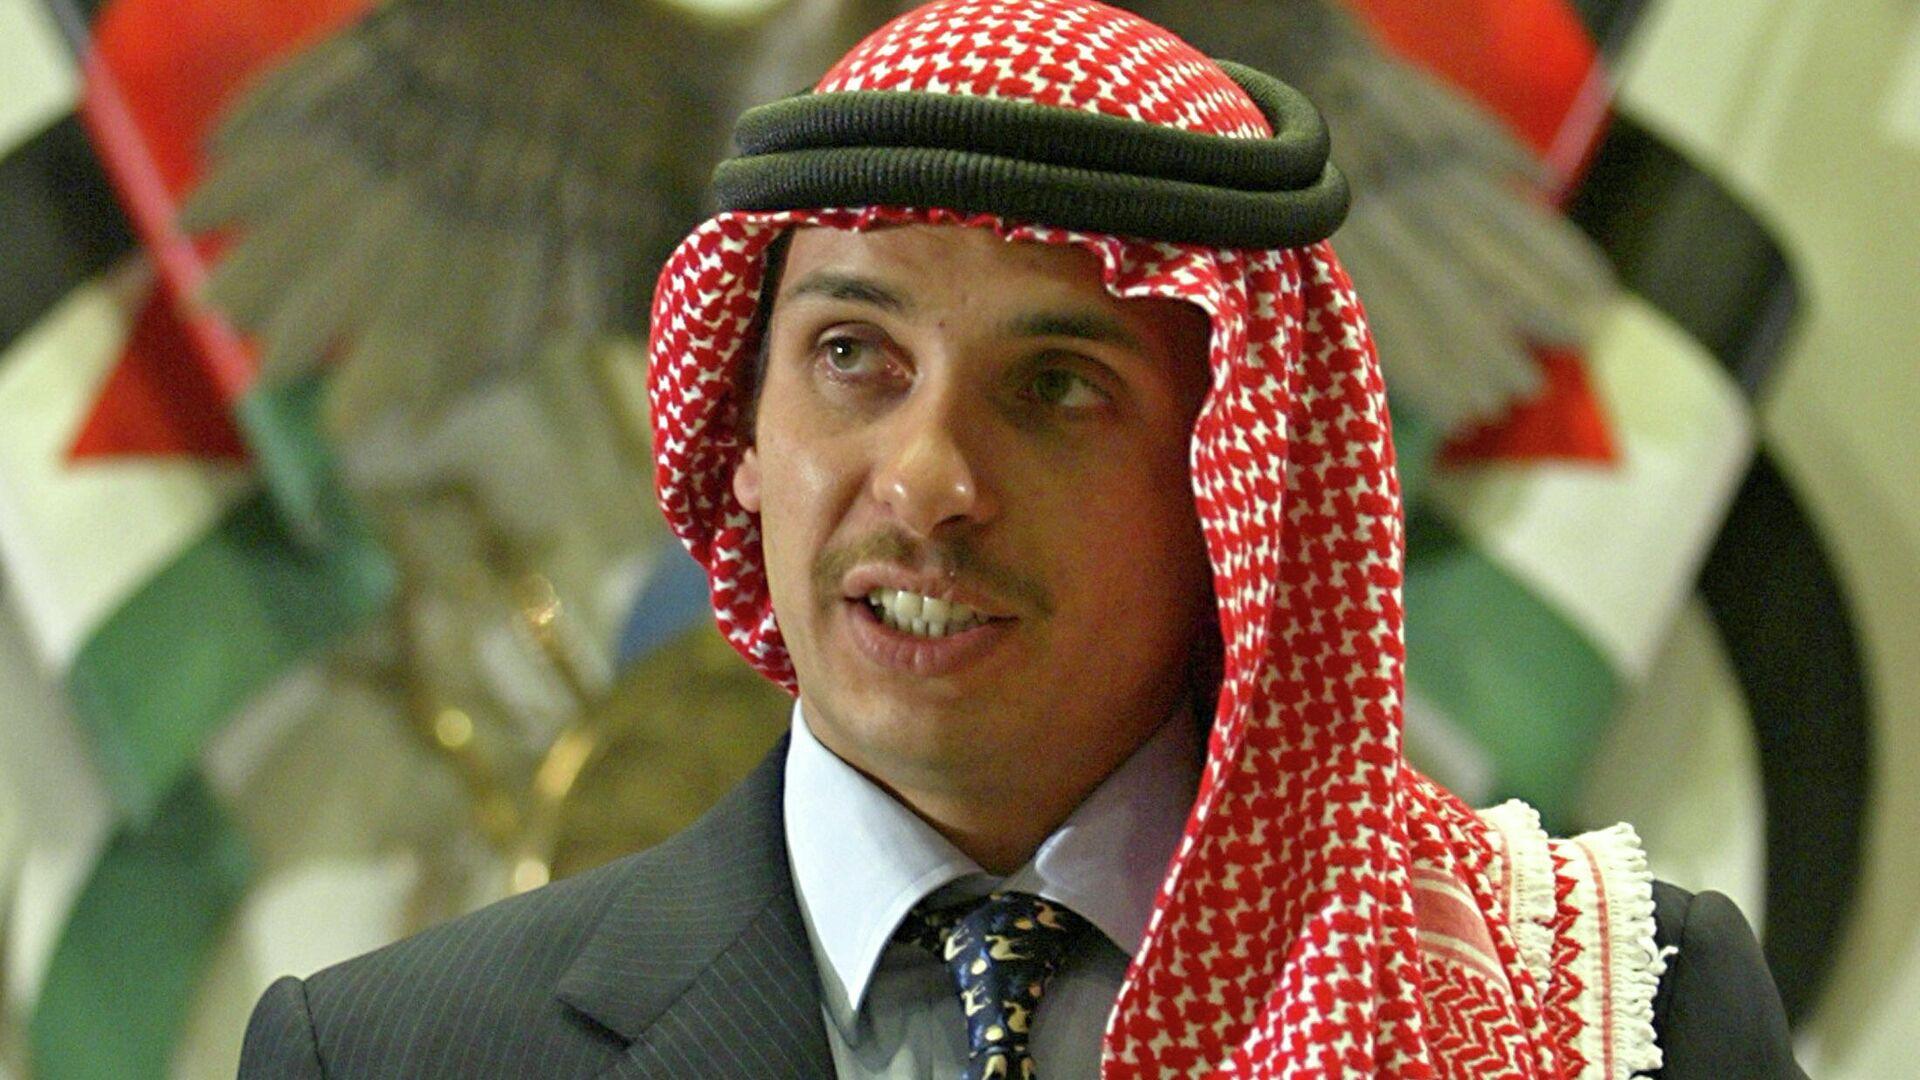 Hamza bin al Hussein, antiguo príncipe heredero de Jordania - Sputnik Mundo, 1920, 03.04.2021